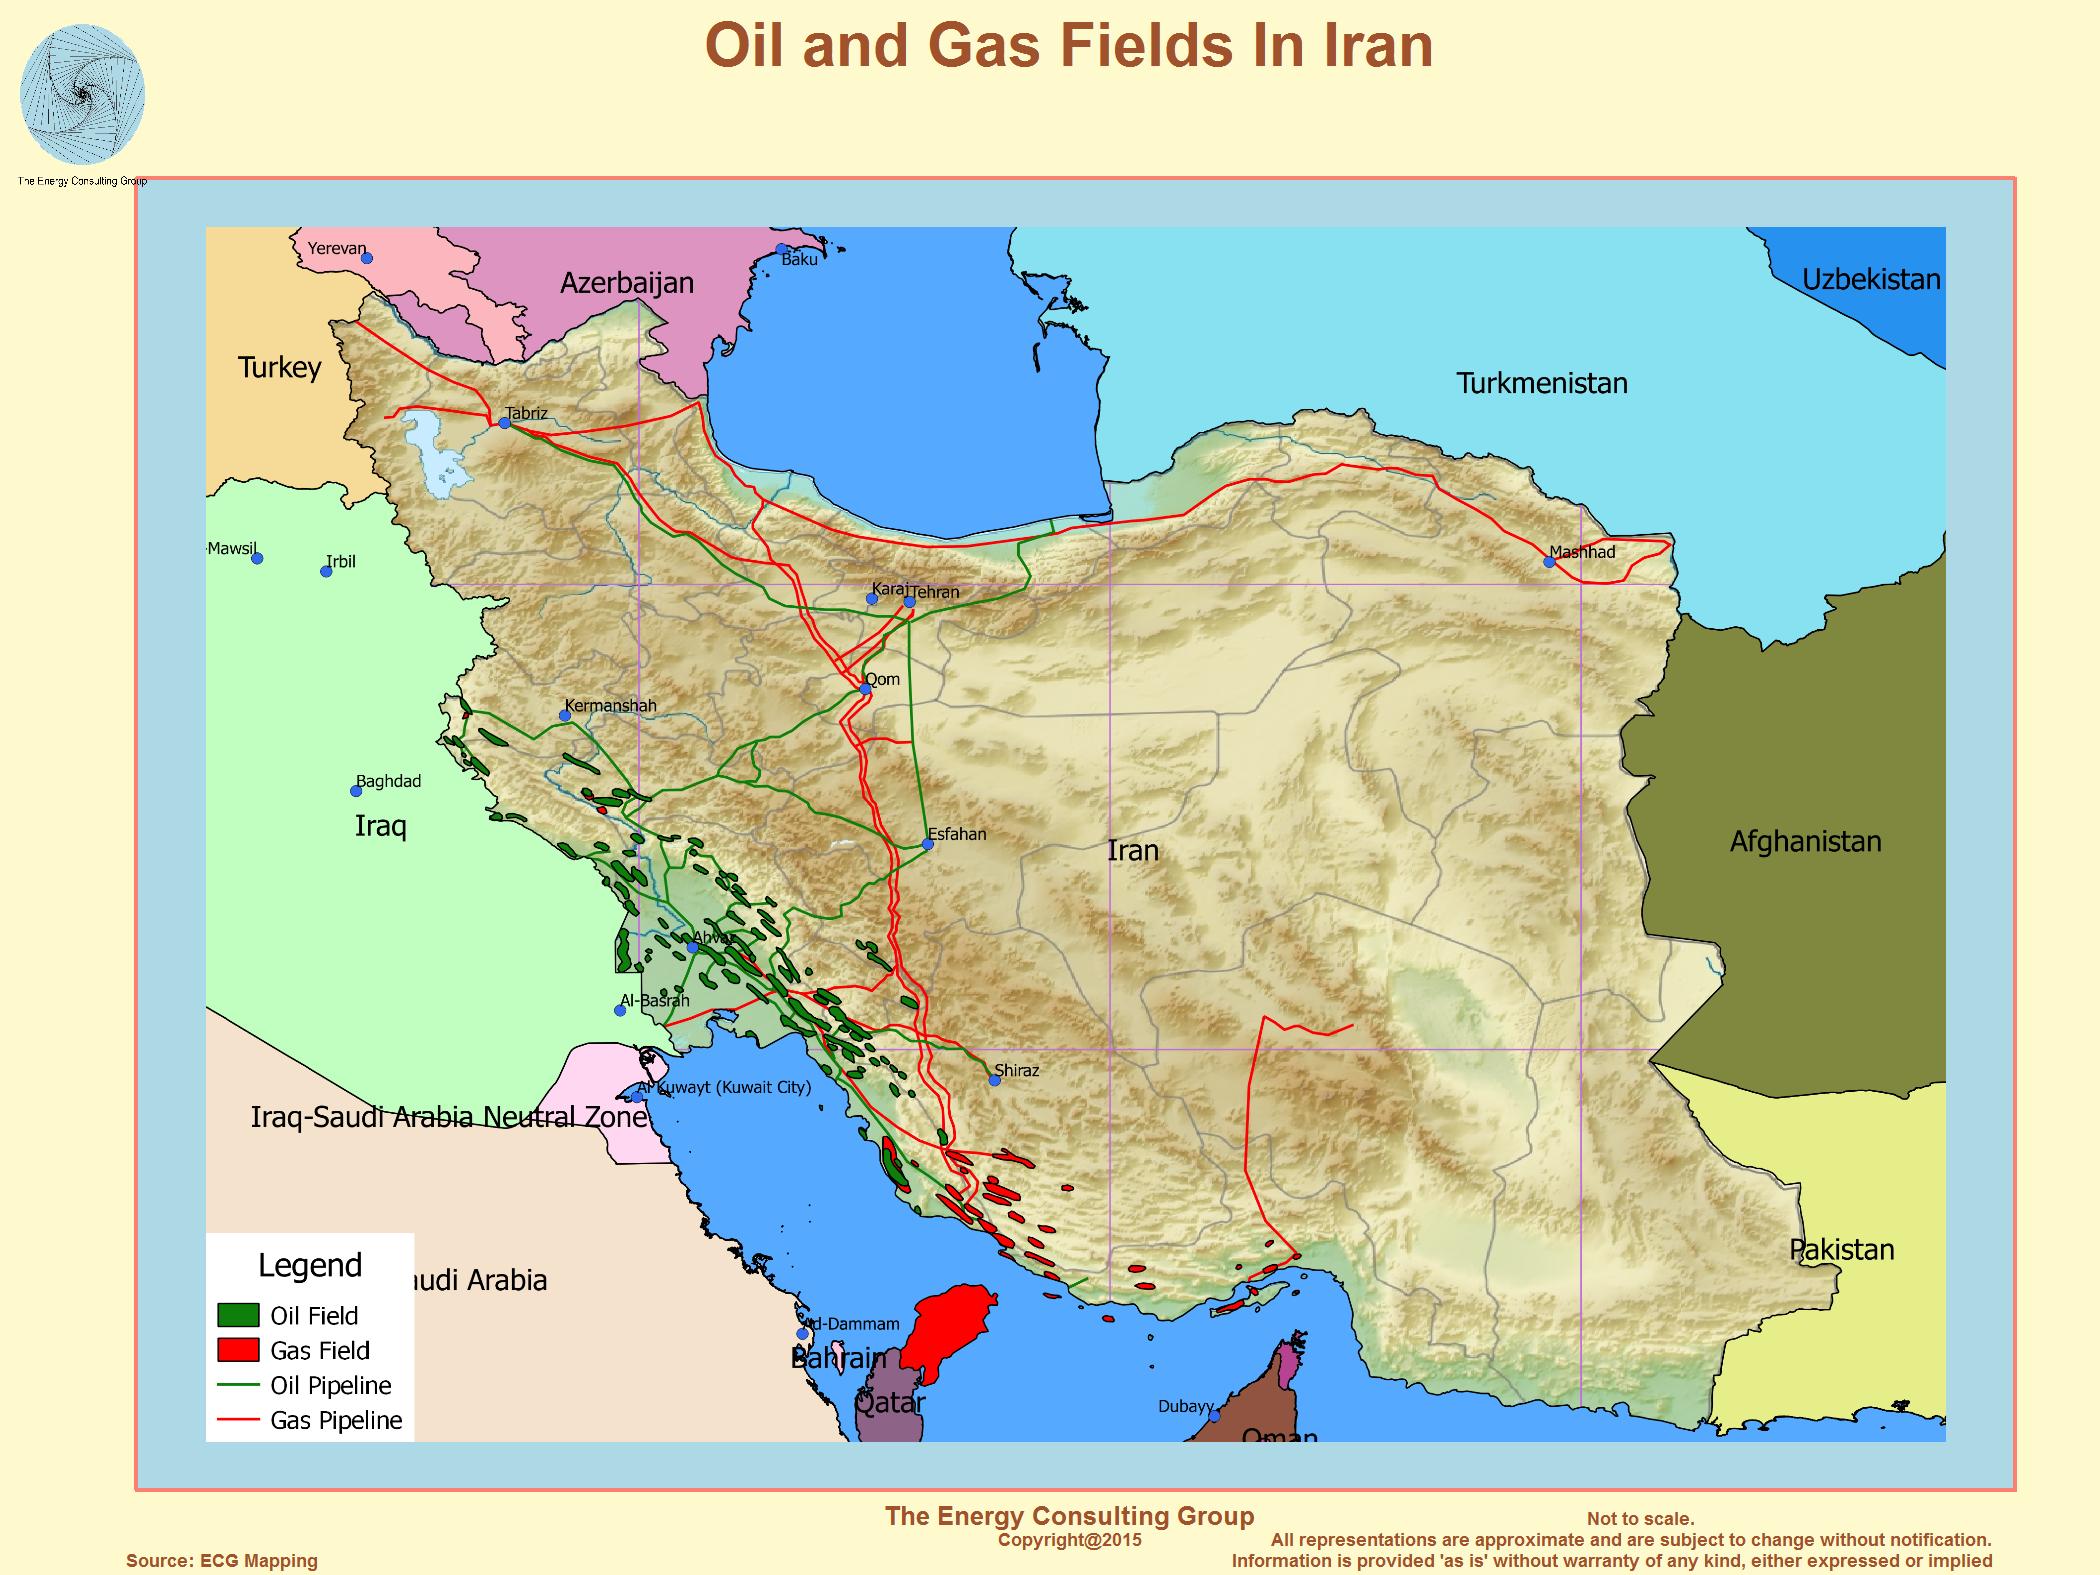 http://www.energy-cg.com/OPEC/Iran/OPEC_Iran_BaseMap_Jun15_Image1x1_EnergyConsutlingGroup_web.png